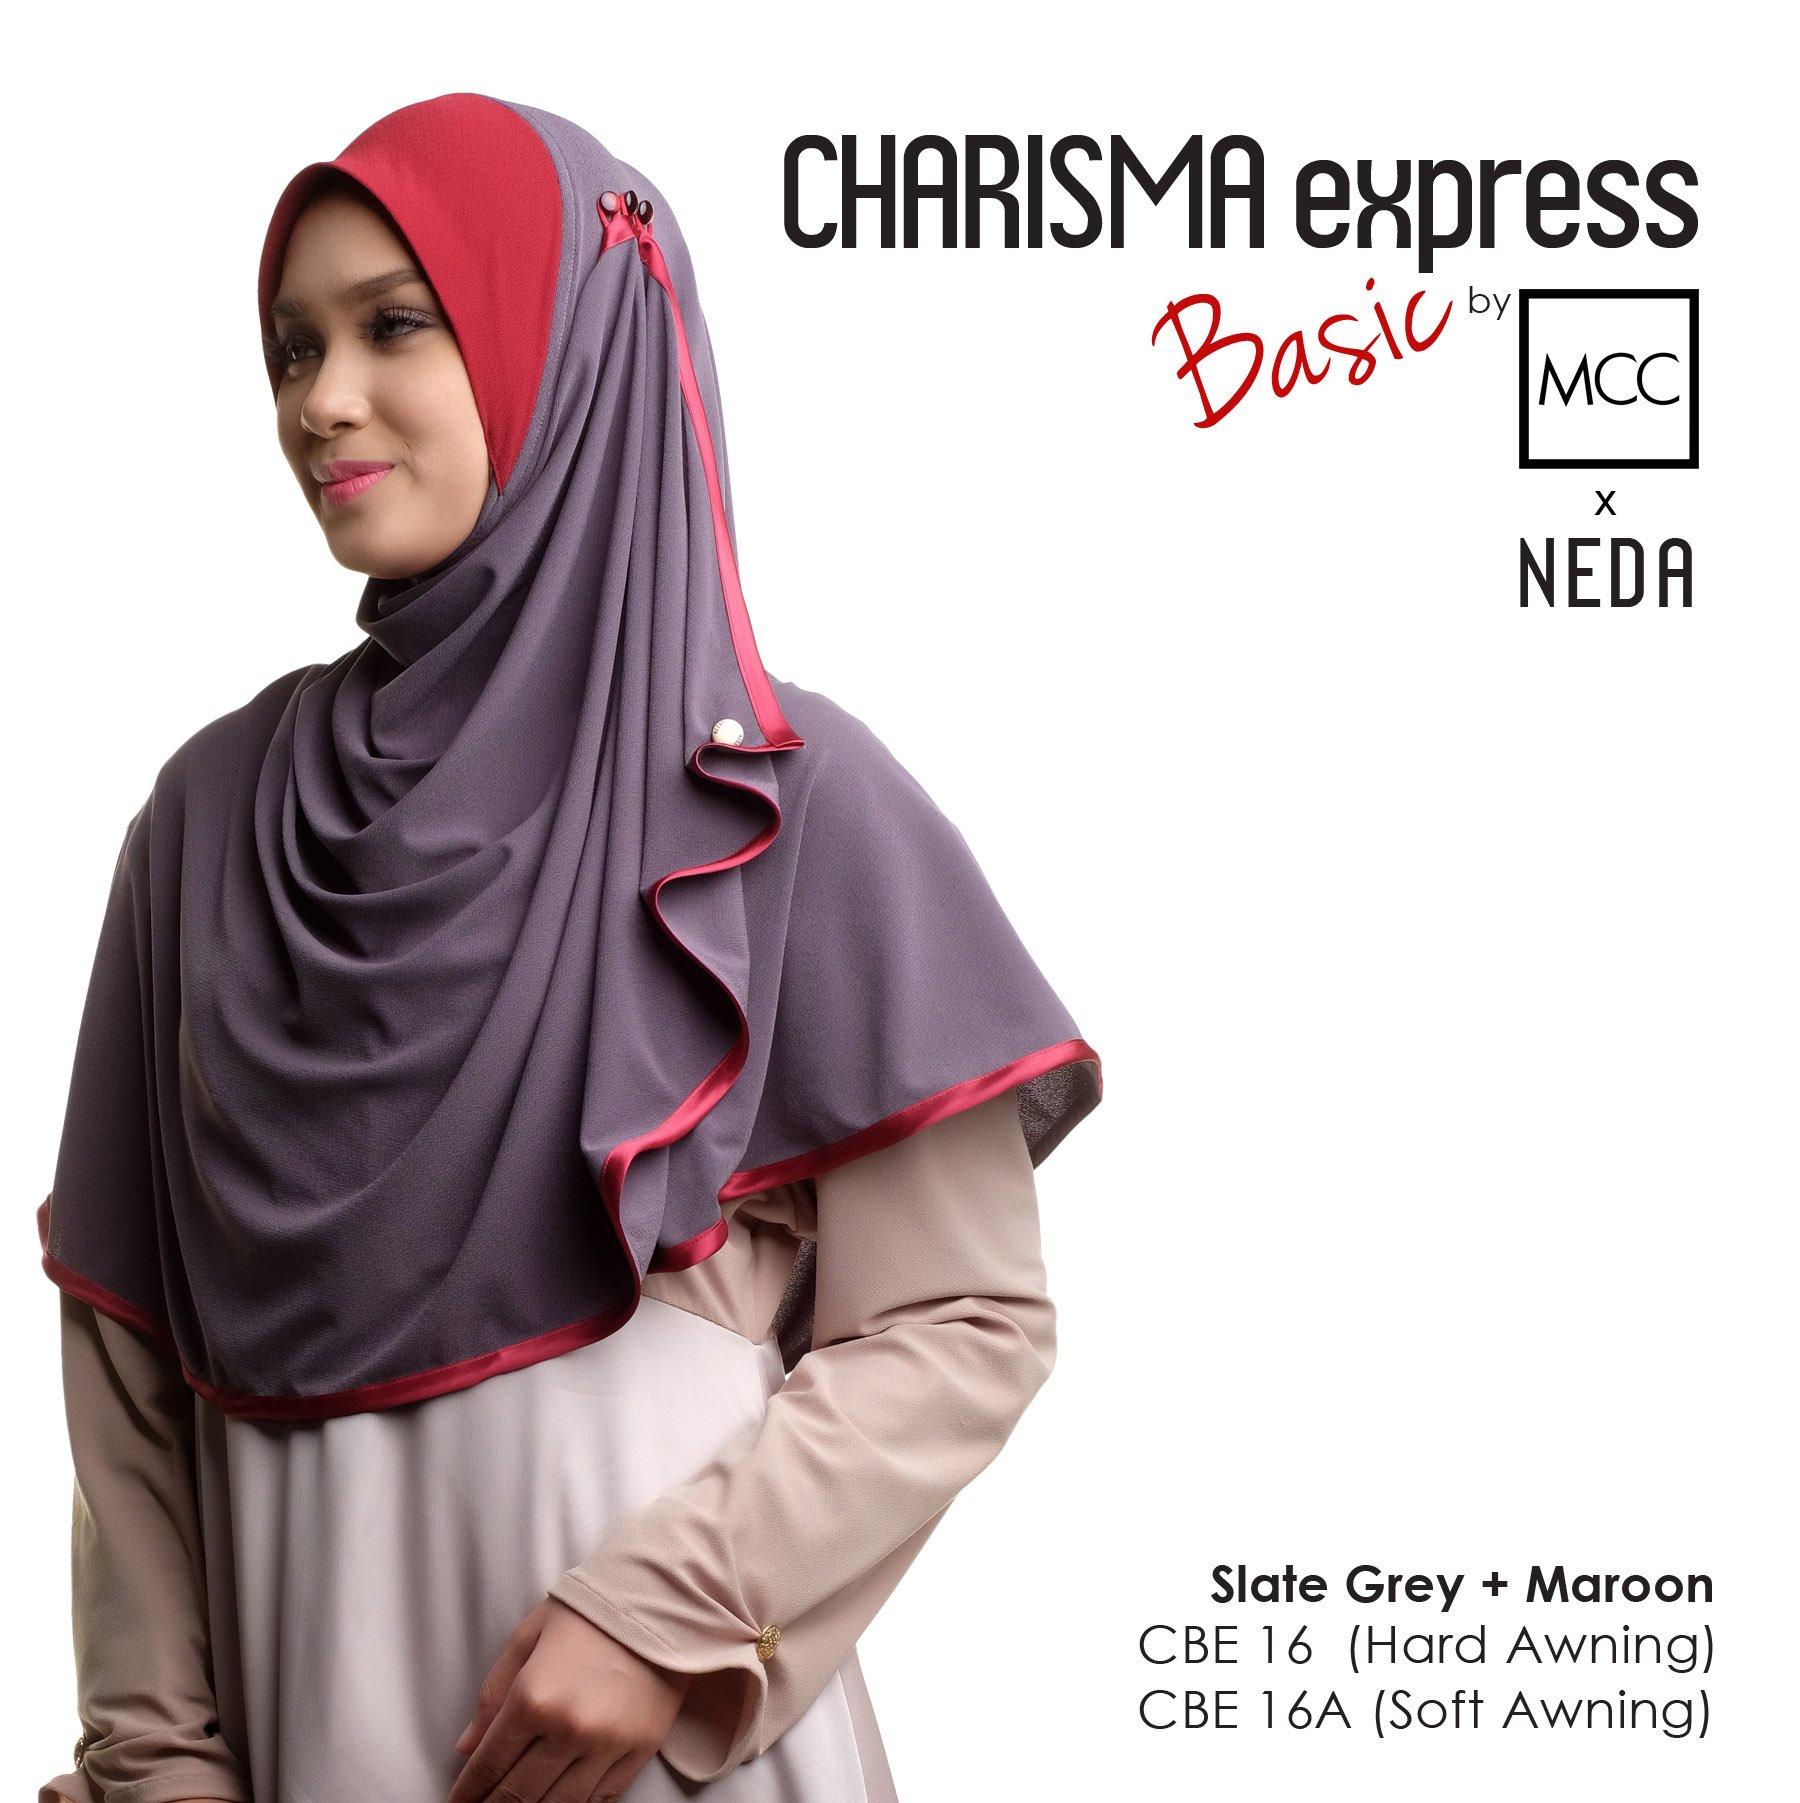 Tudung Charisma Express Basic Mcc X Neda Slate Grey